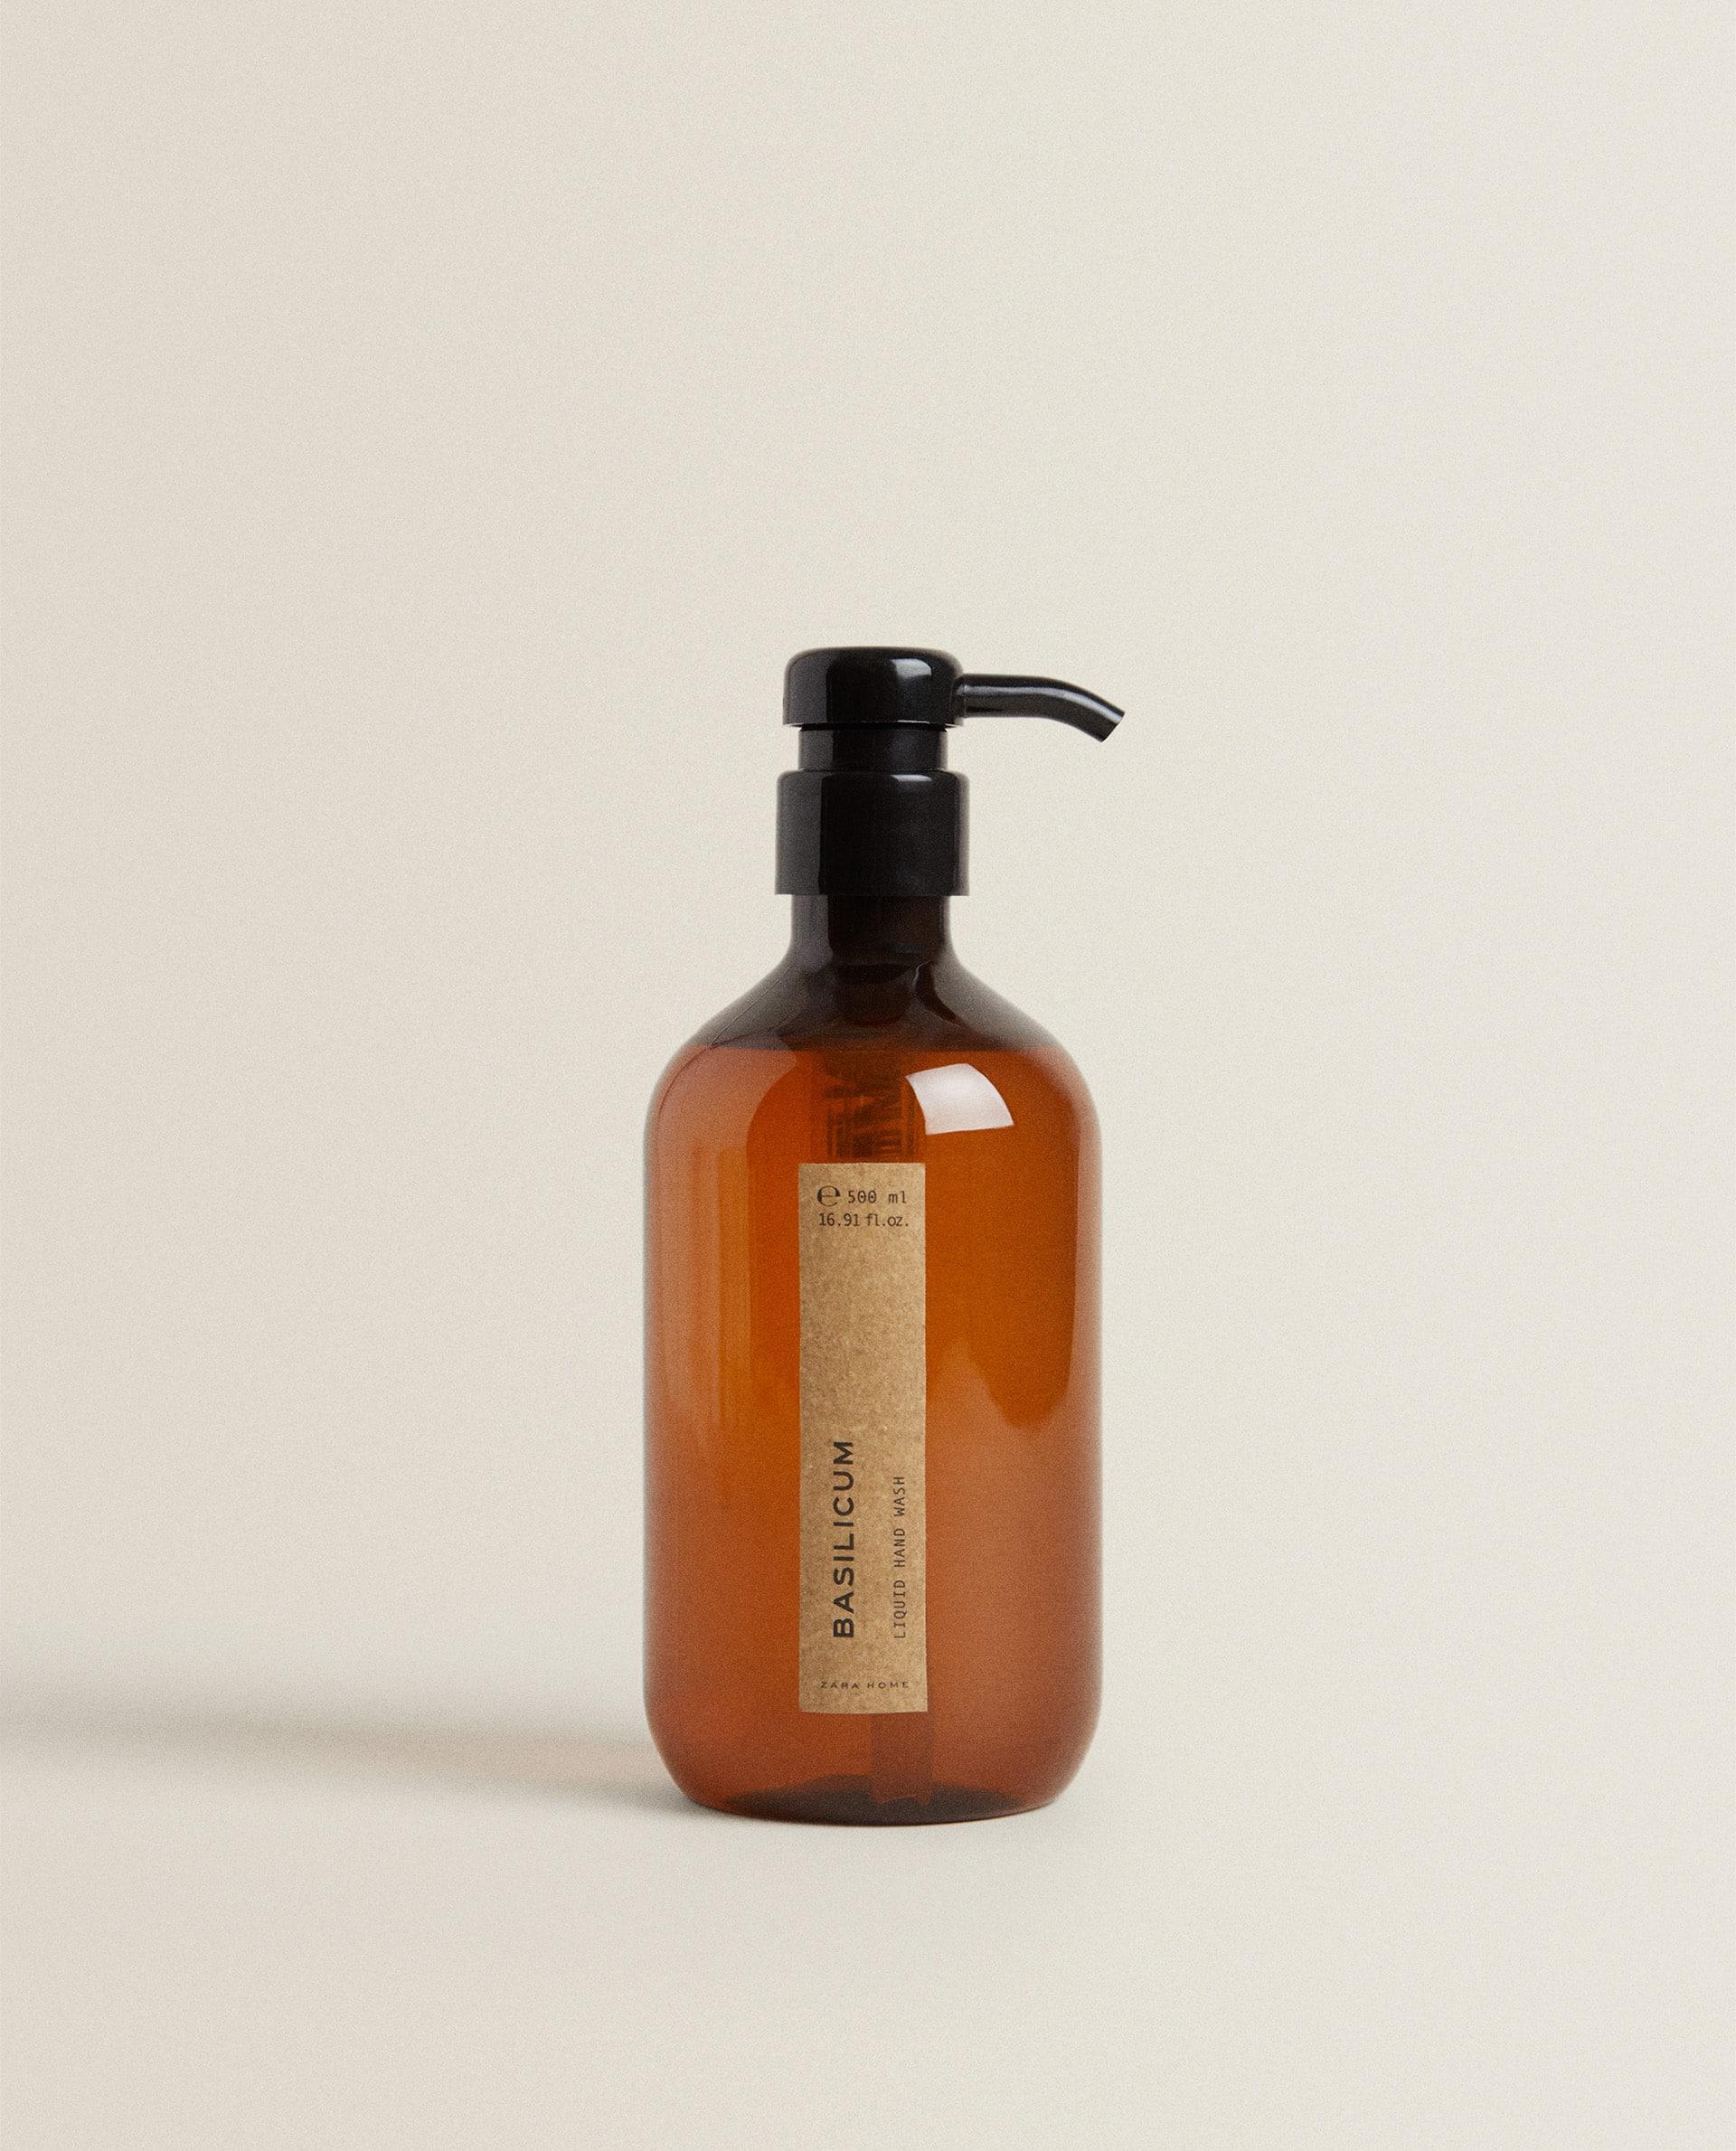 500 ML) BASILICUM LIQUID HAND SOAP - Reed diffusers - PRODUCTS - FRAGRANCES    Zara Home Italia